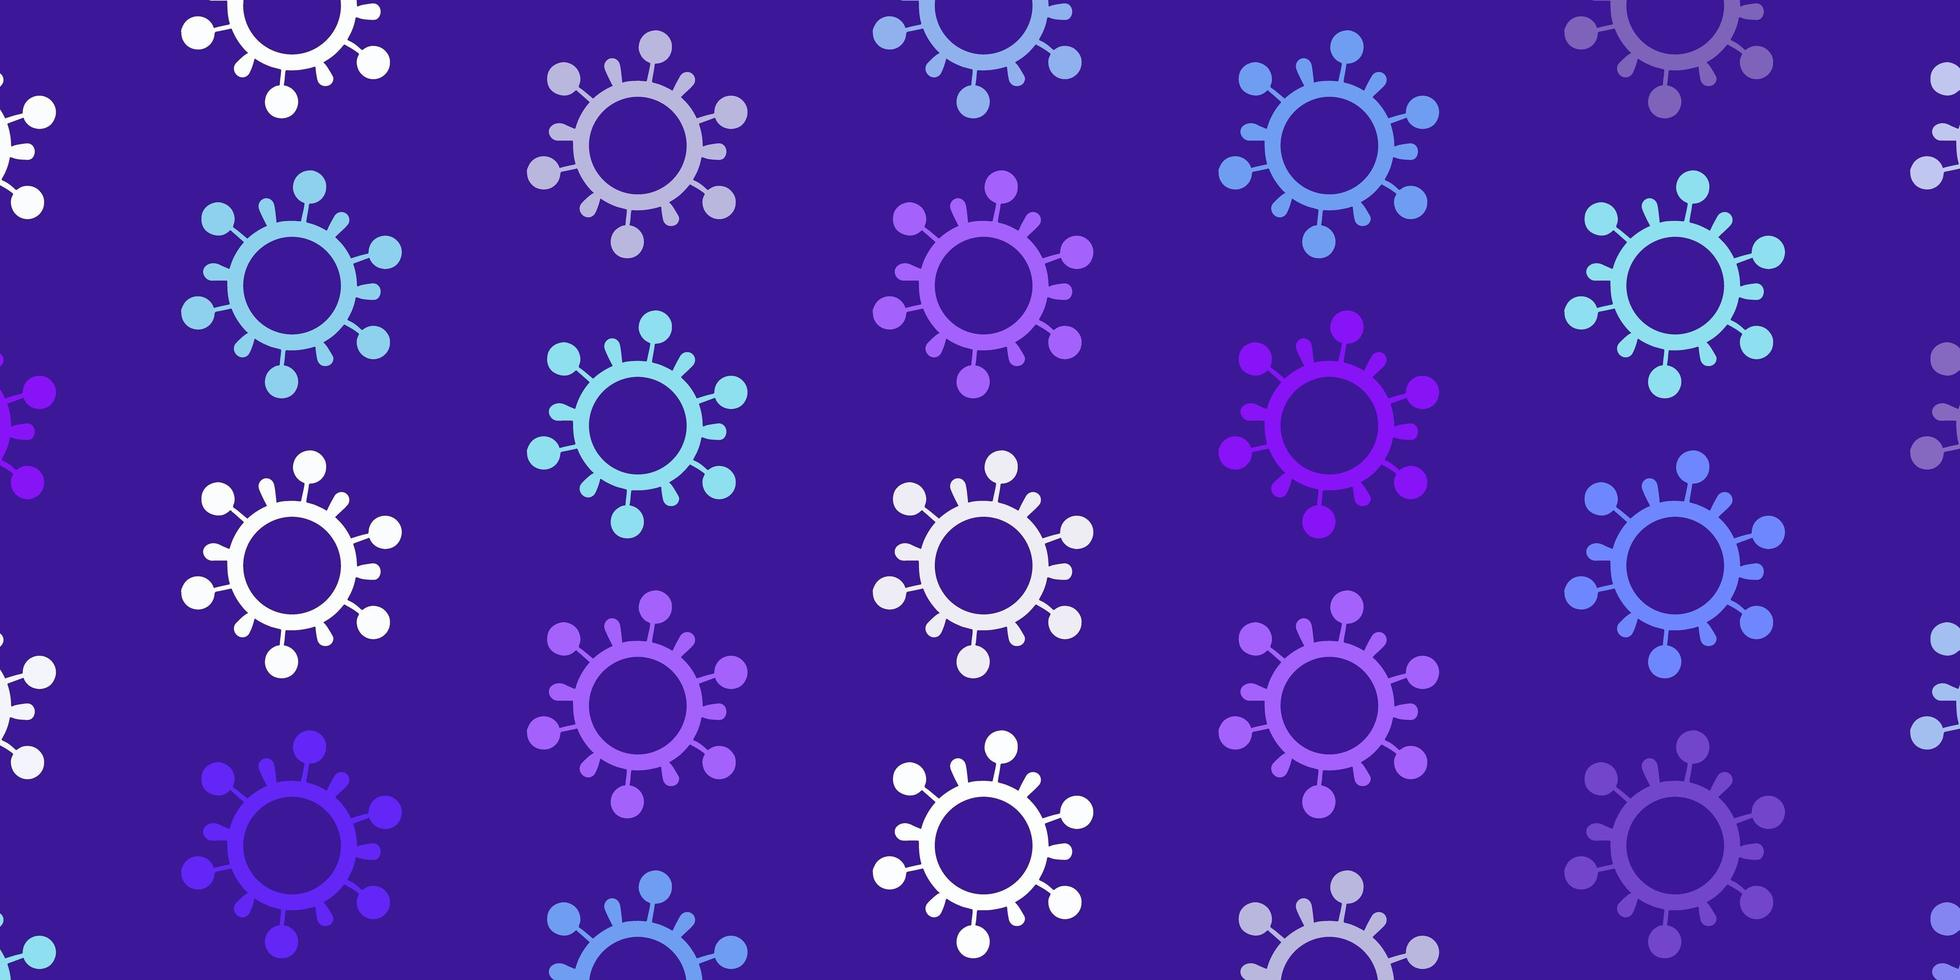 texture de vecteur rose clair, bleu avec des symboles de la maladie.